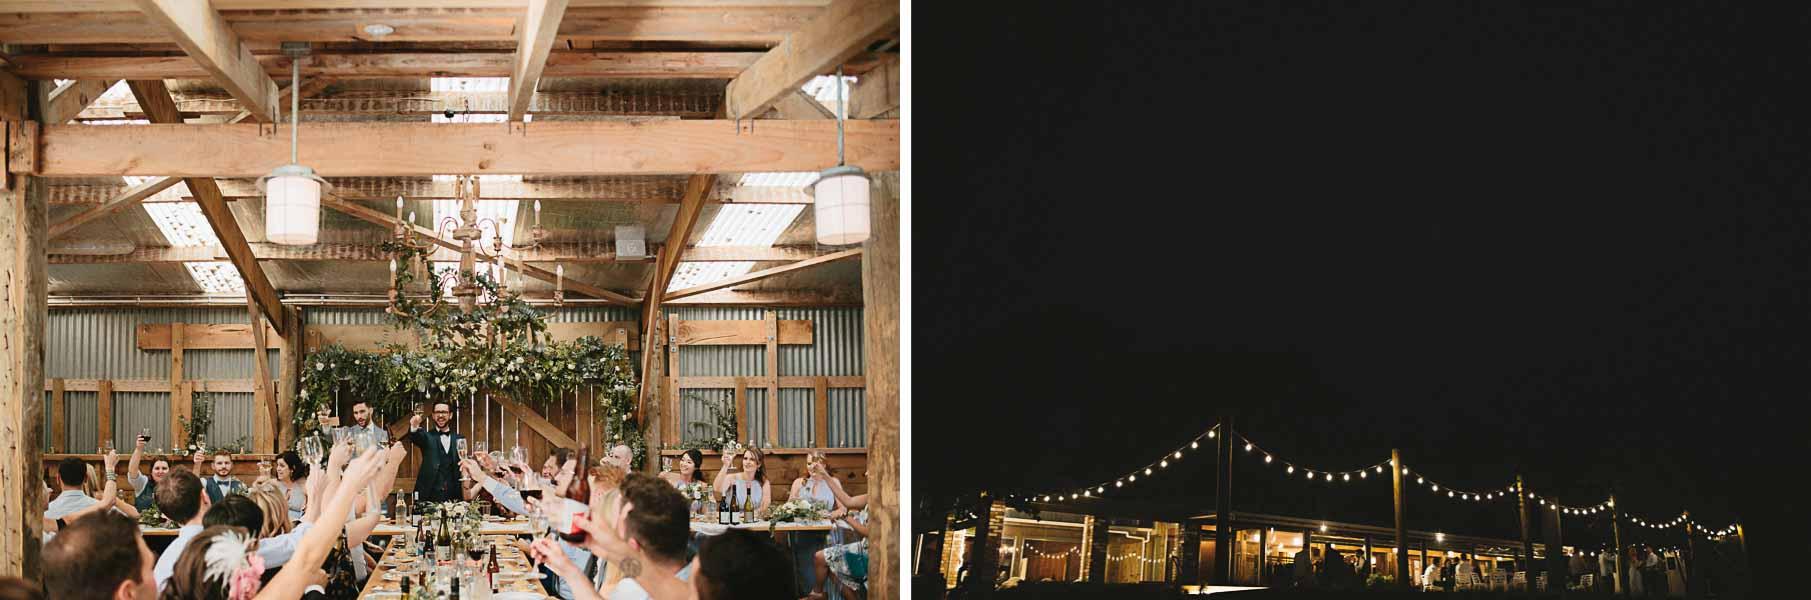 Wedding venues wellington.jpg